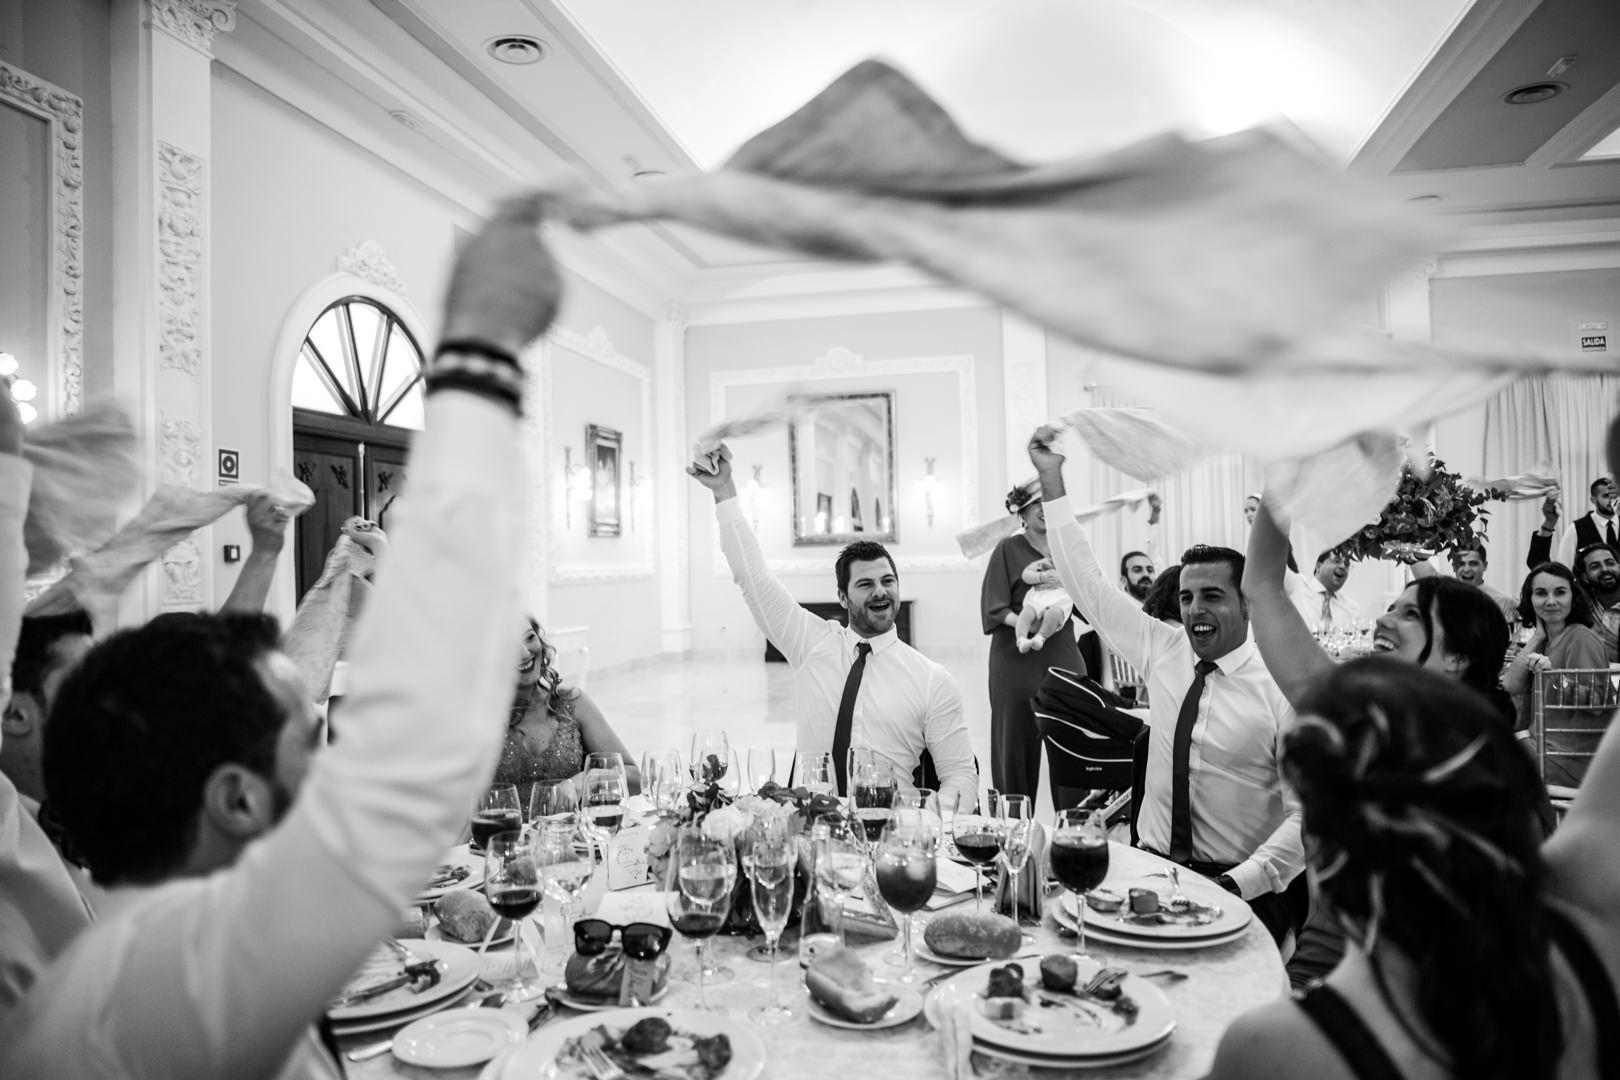 Boda-Catedral-Jaen-Hamburgo-Maria-David-engagement-Rafael-Torres-fotografo-bodas-sevilla-madrid-barcelona-wedding-photographer--38.jpg